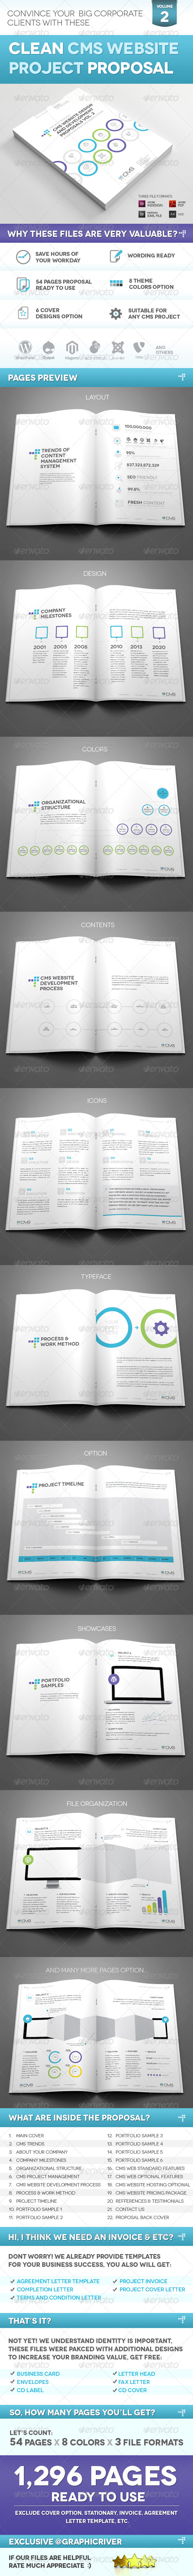 Clean CMS Web Proposal Vol 2